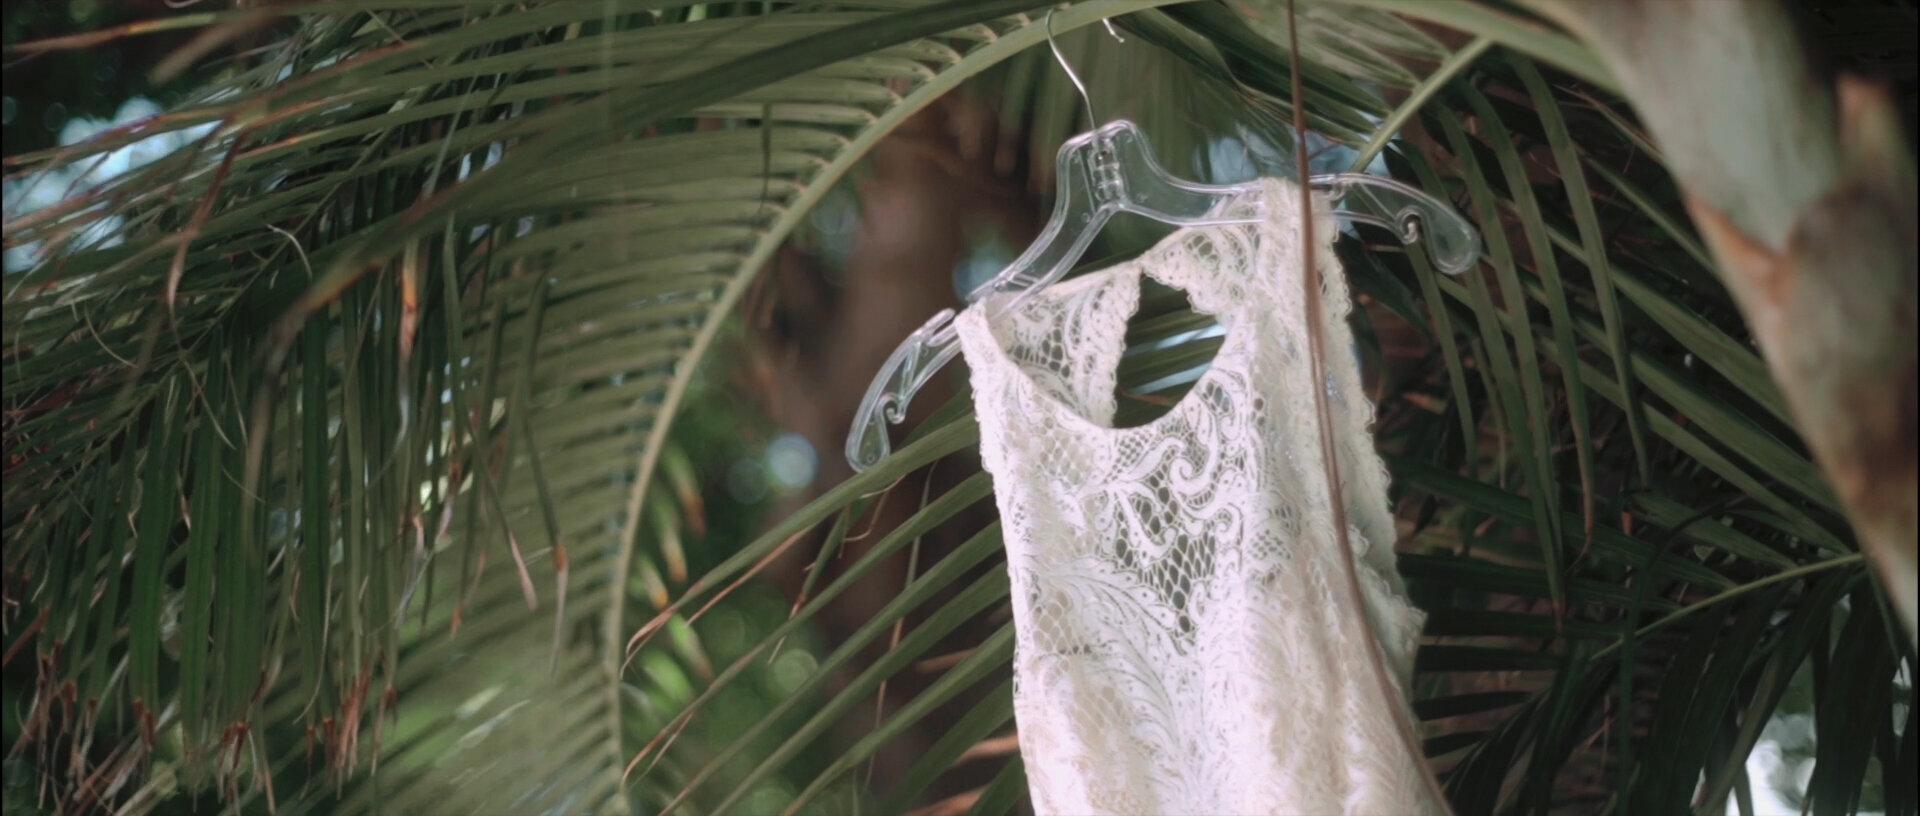 Wedding Dress hanging at Olowalu Plantation House greenery